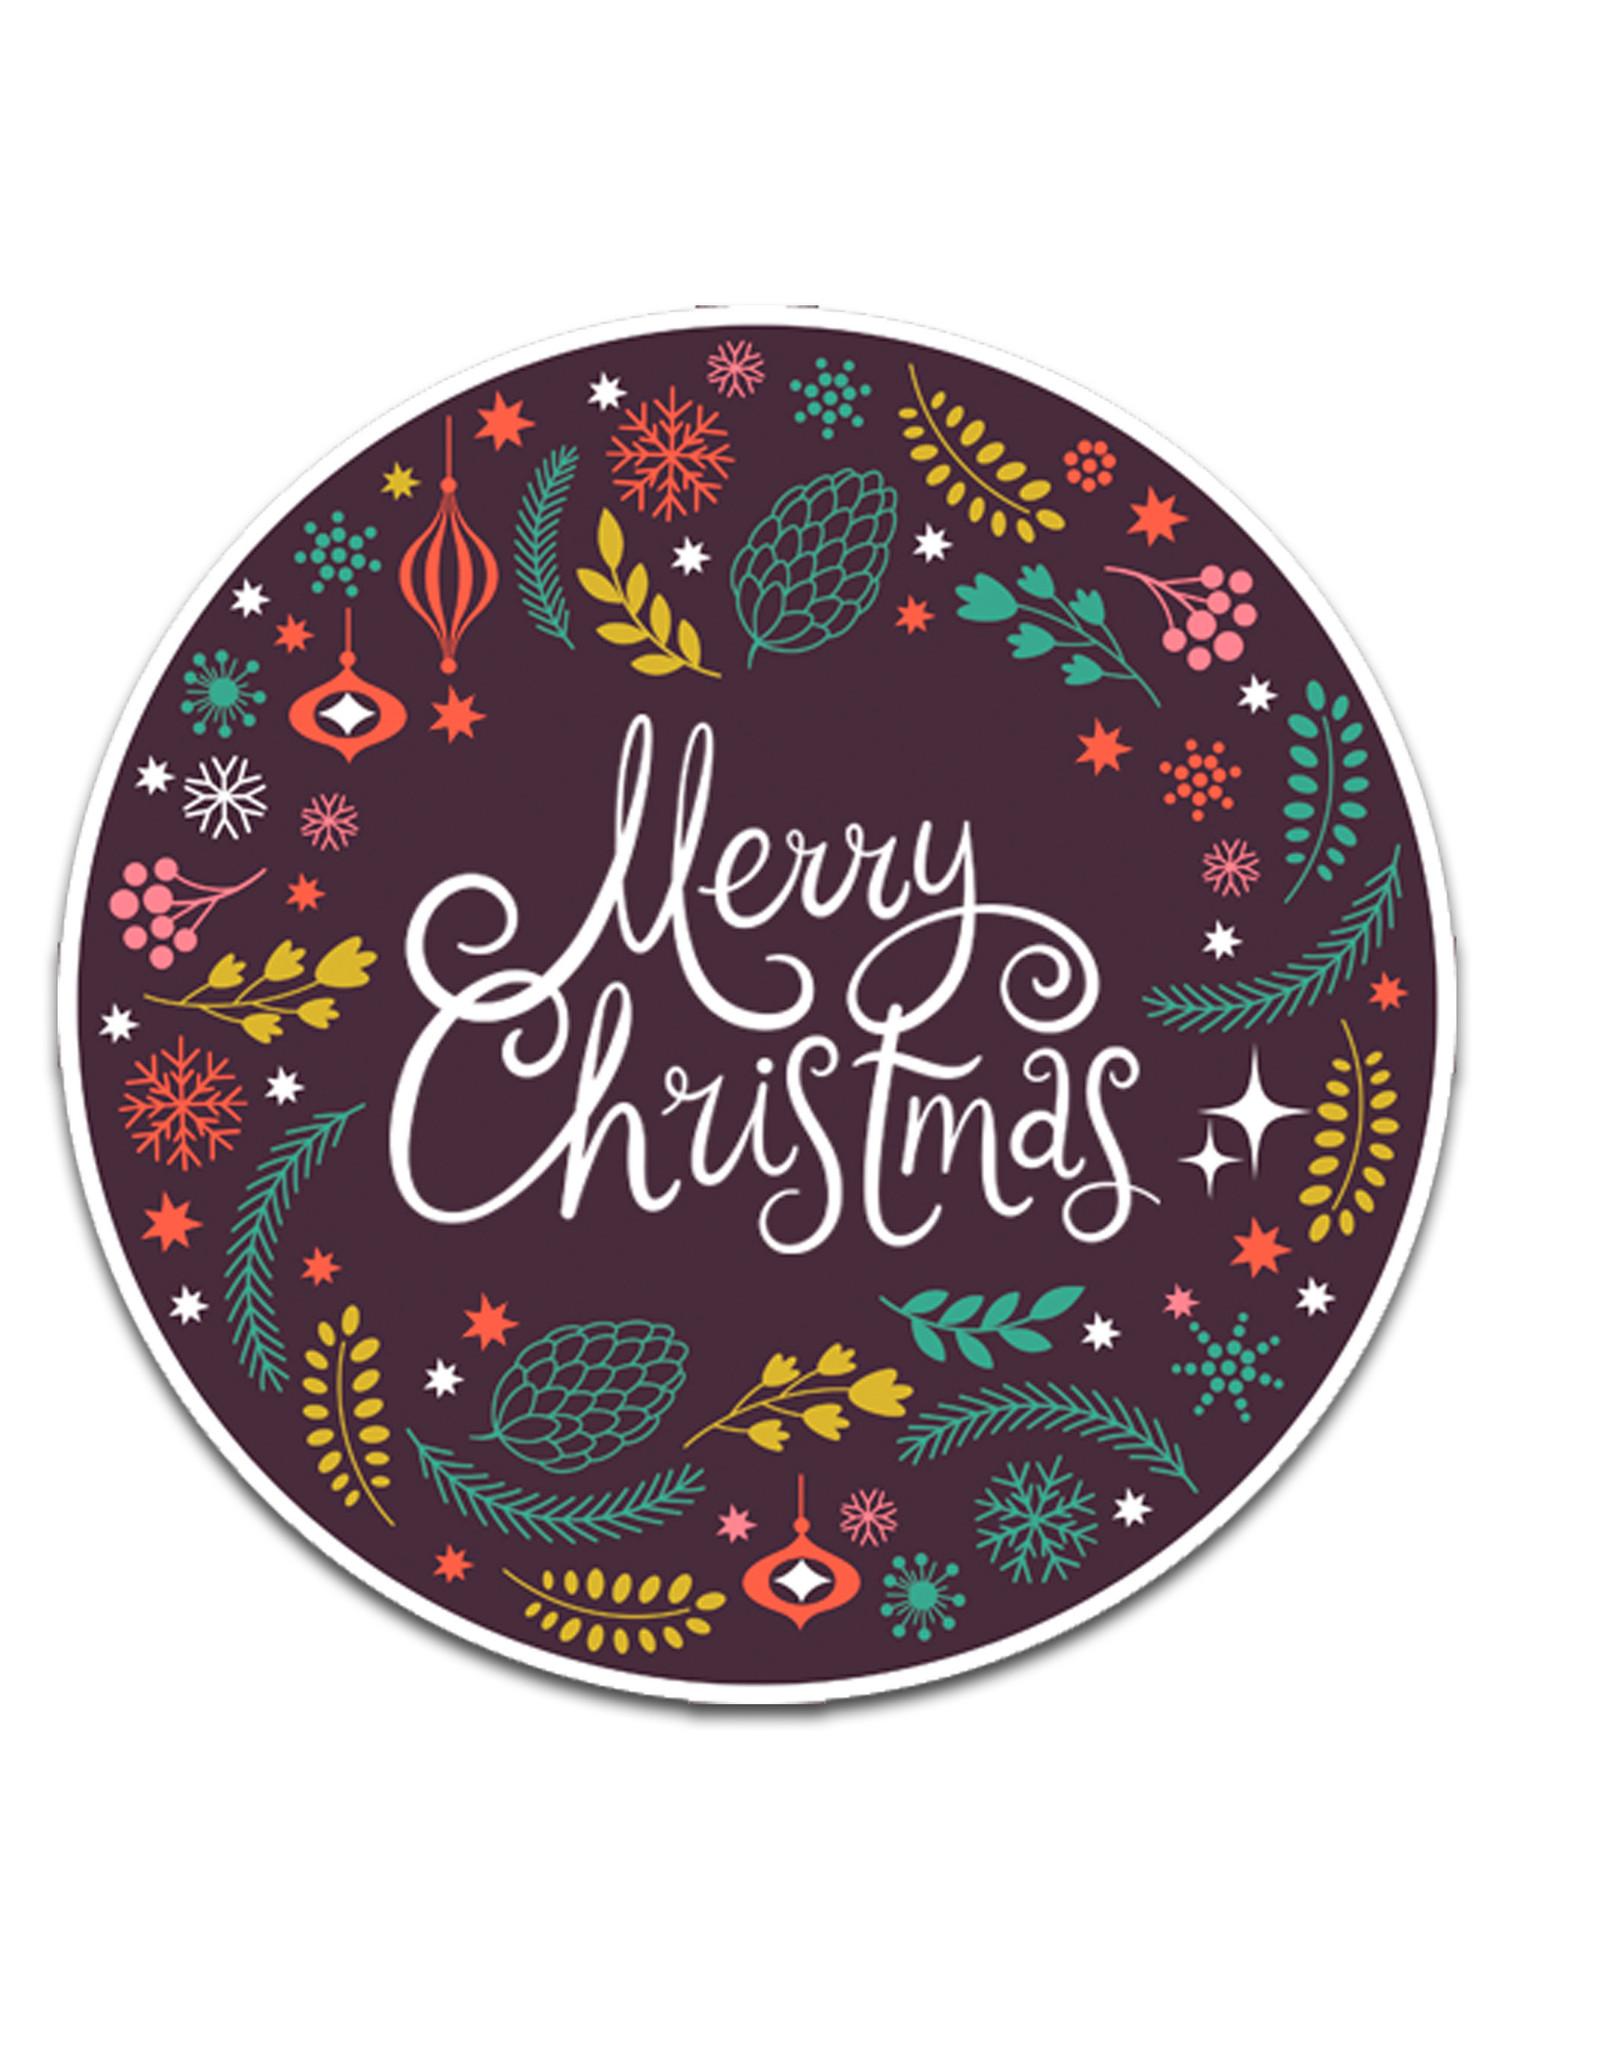 25 Sticker Merry Christmas, Christmas sticker